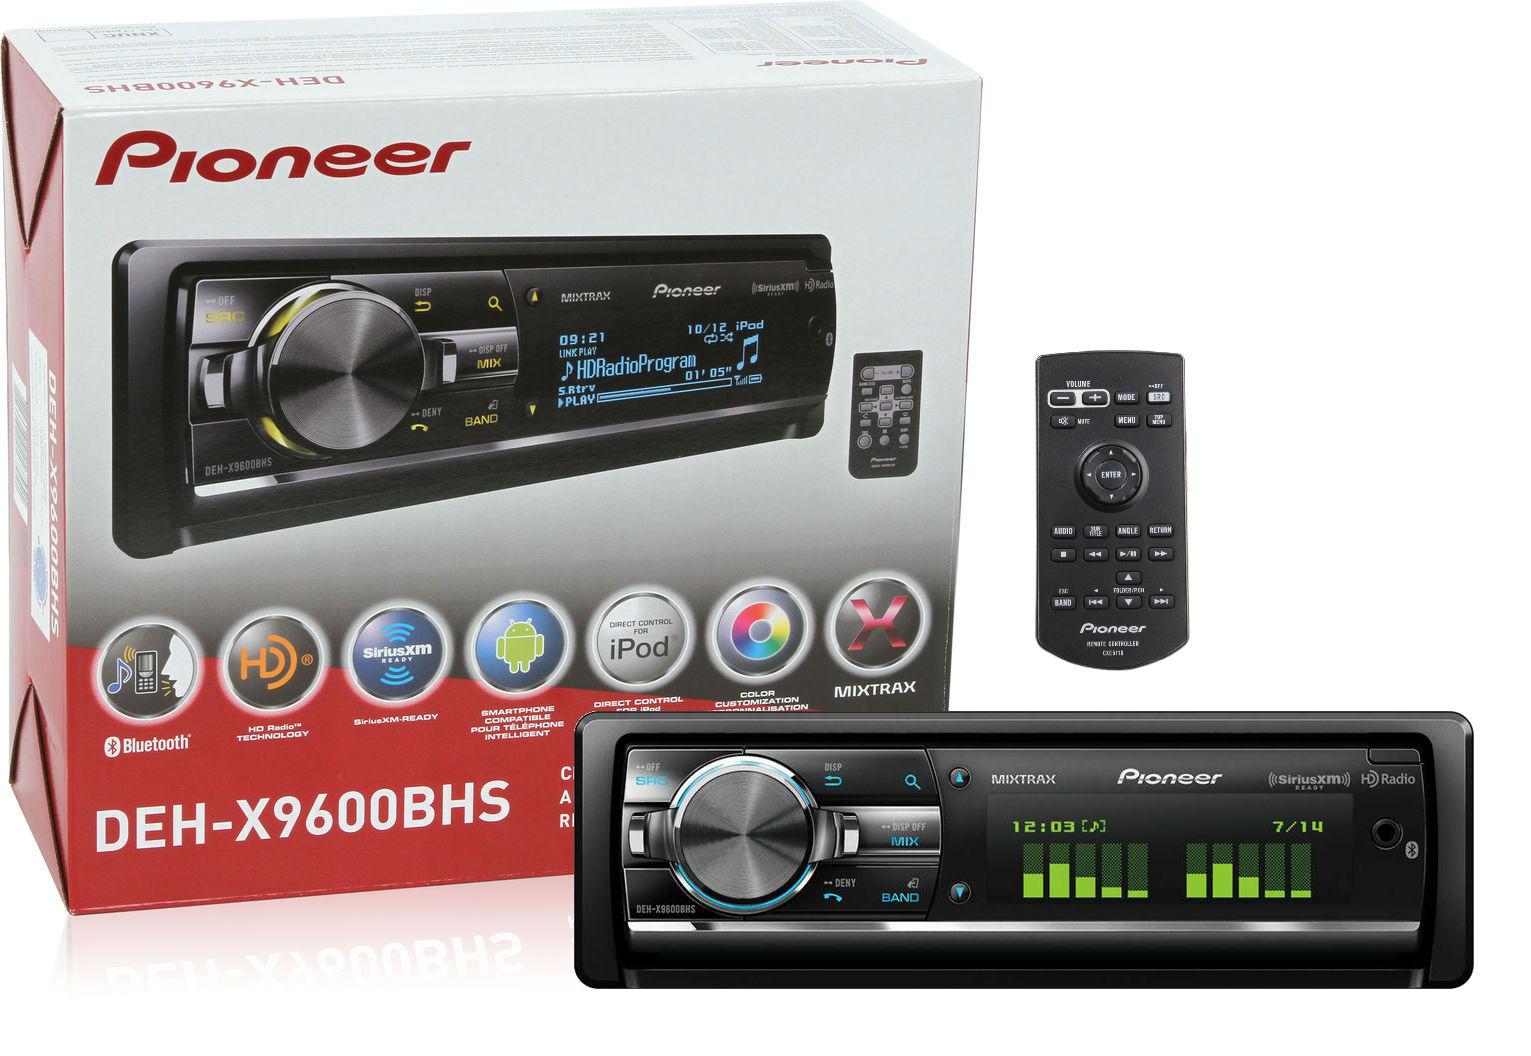 pioneer deh x9600bhs cd receiver bluetooth hd radio. Black Bedroom Furniture Sets. Home Design Ideas